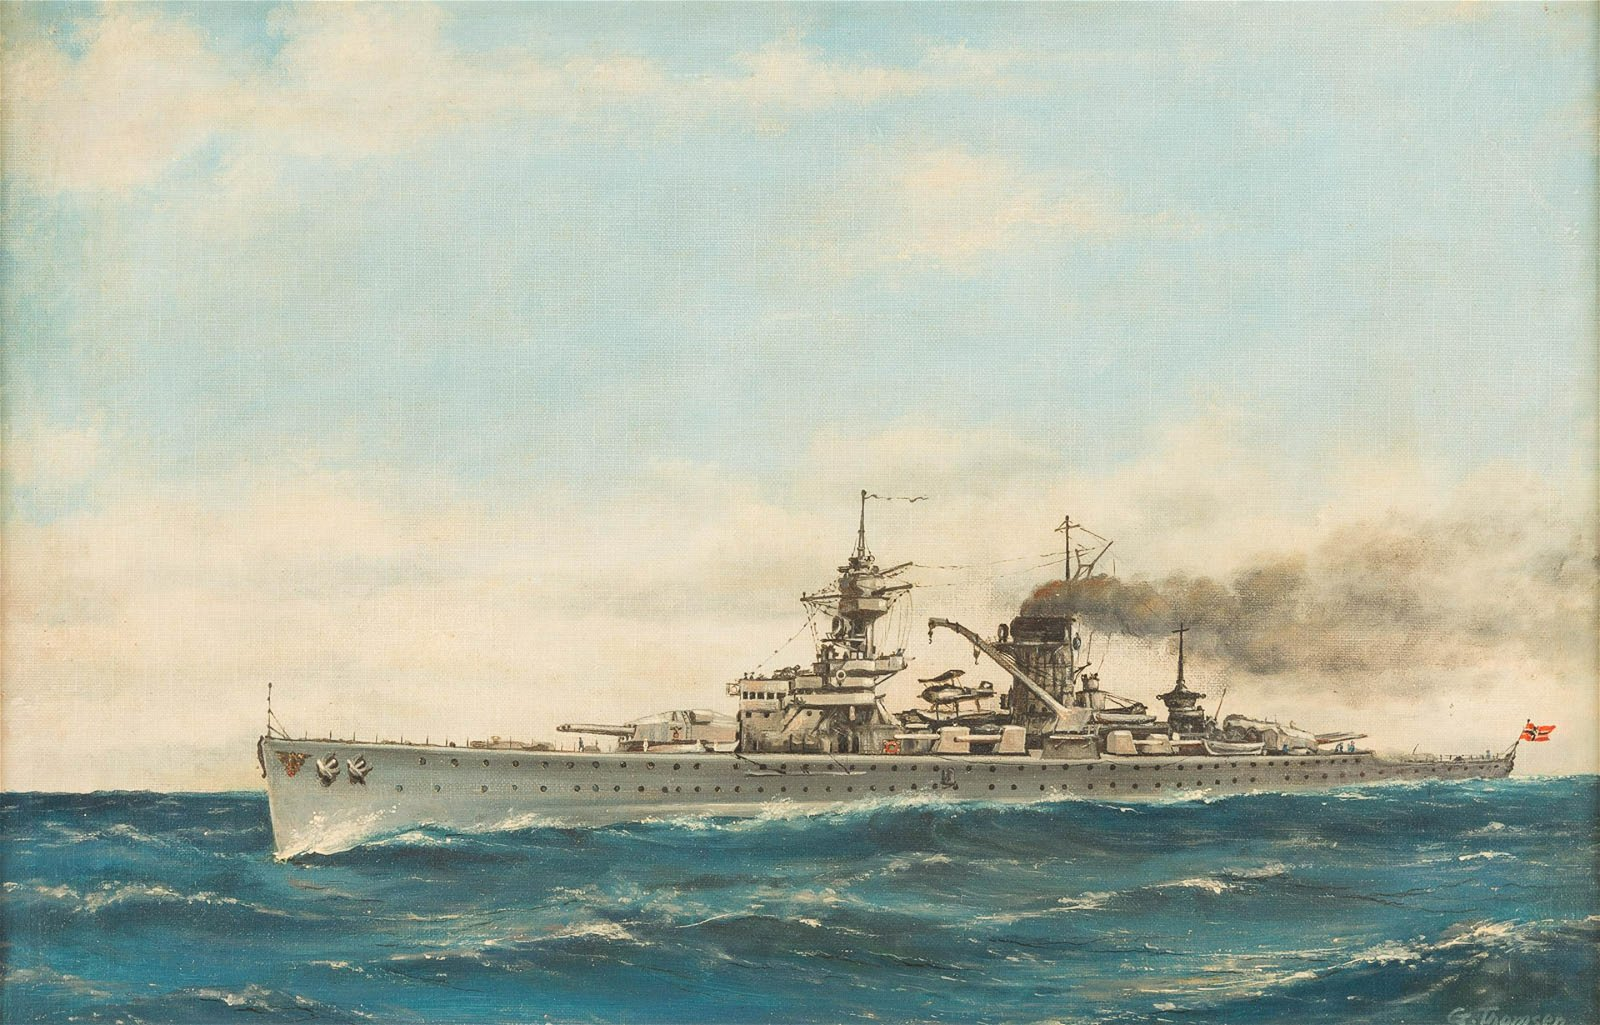 G. THOMSEN Act. 1st half 20th C. German warship Oil on